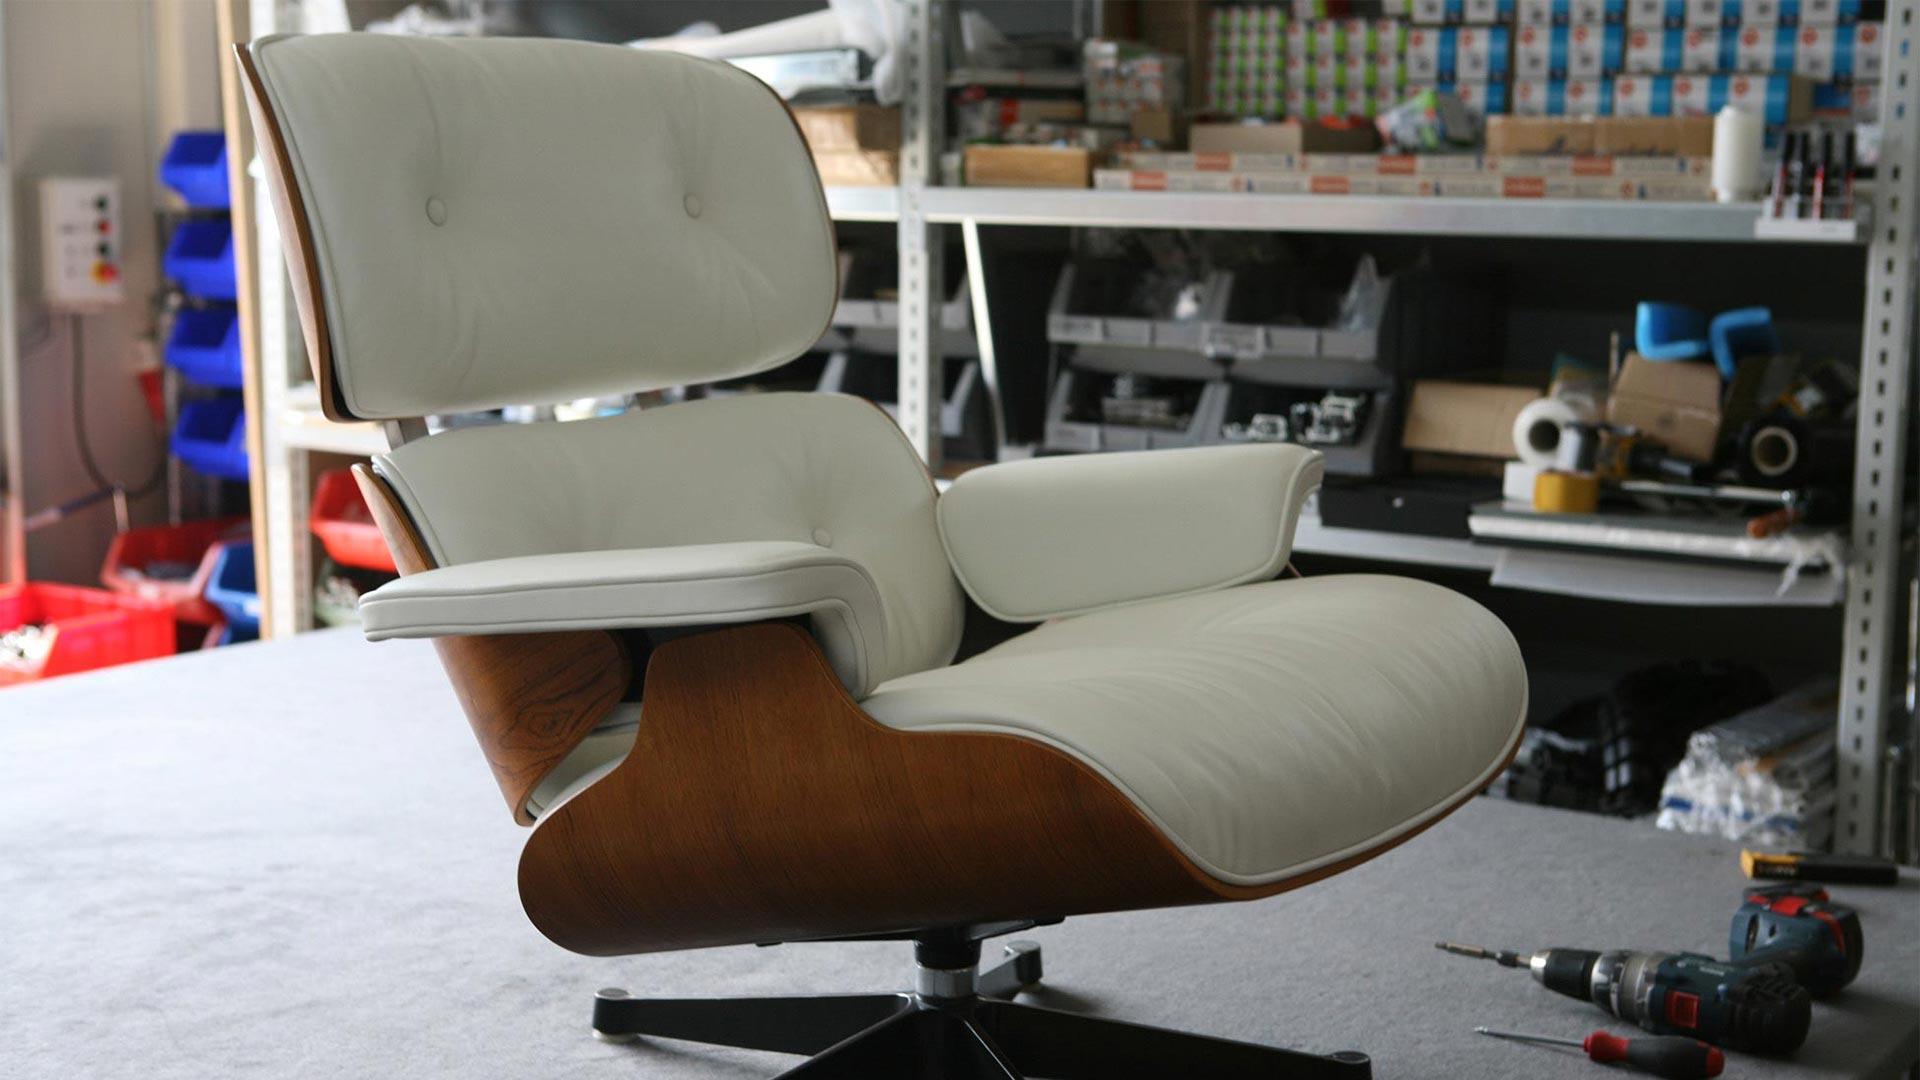 Reparatur Vitra Eames Lounge Chair Ersatzteile in Berlin bei steiden+09